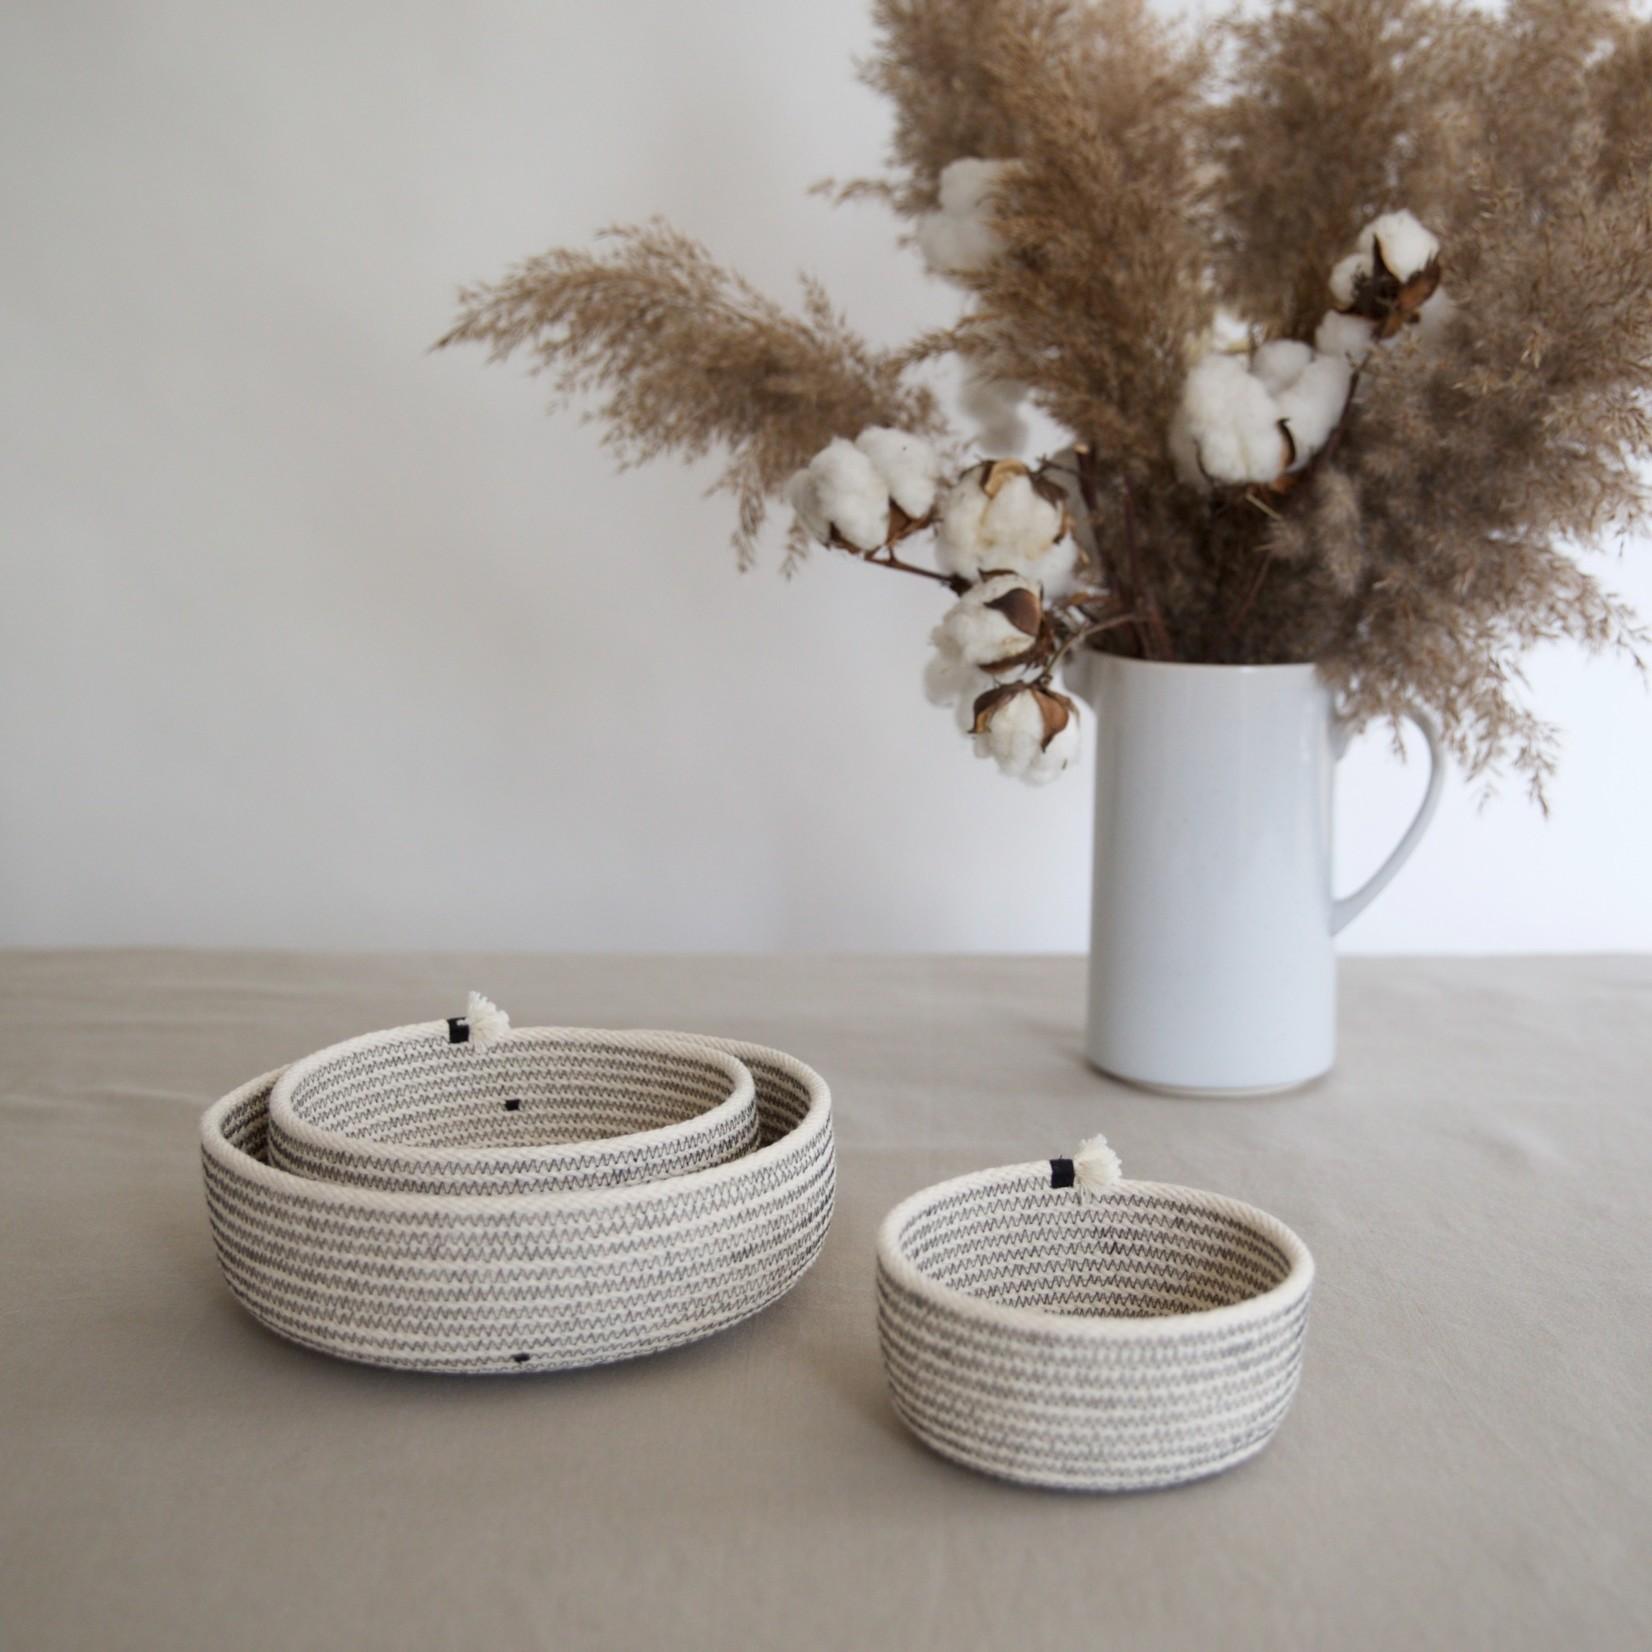 Nesting Basket (Set of 3)